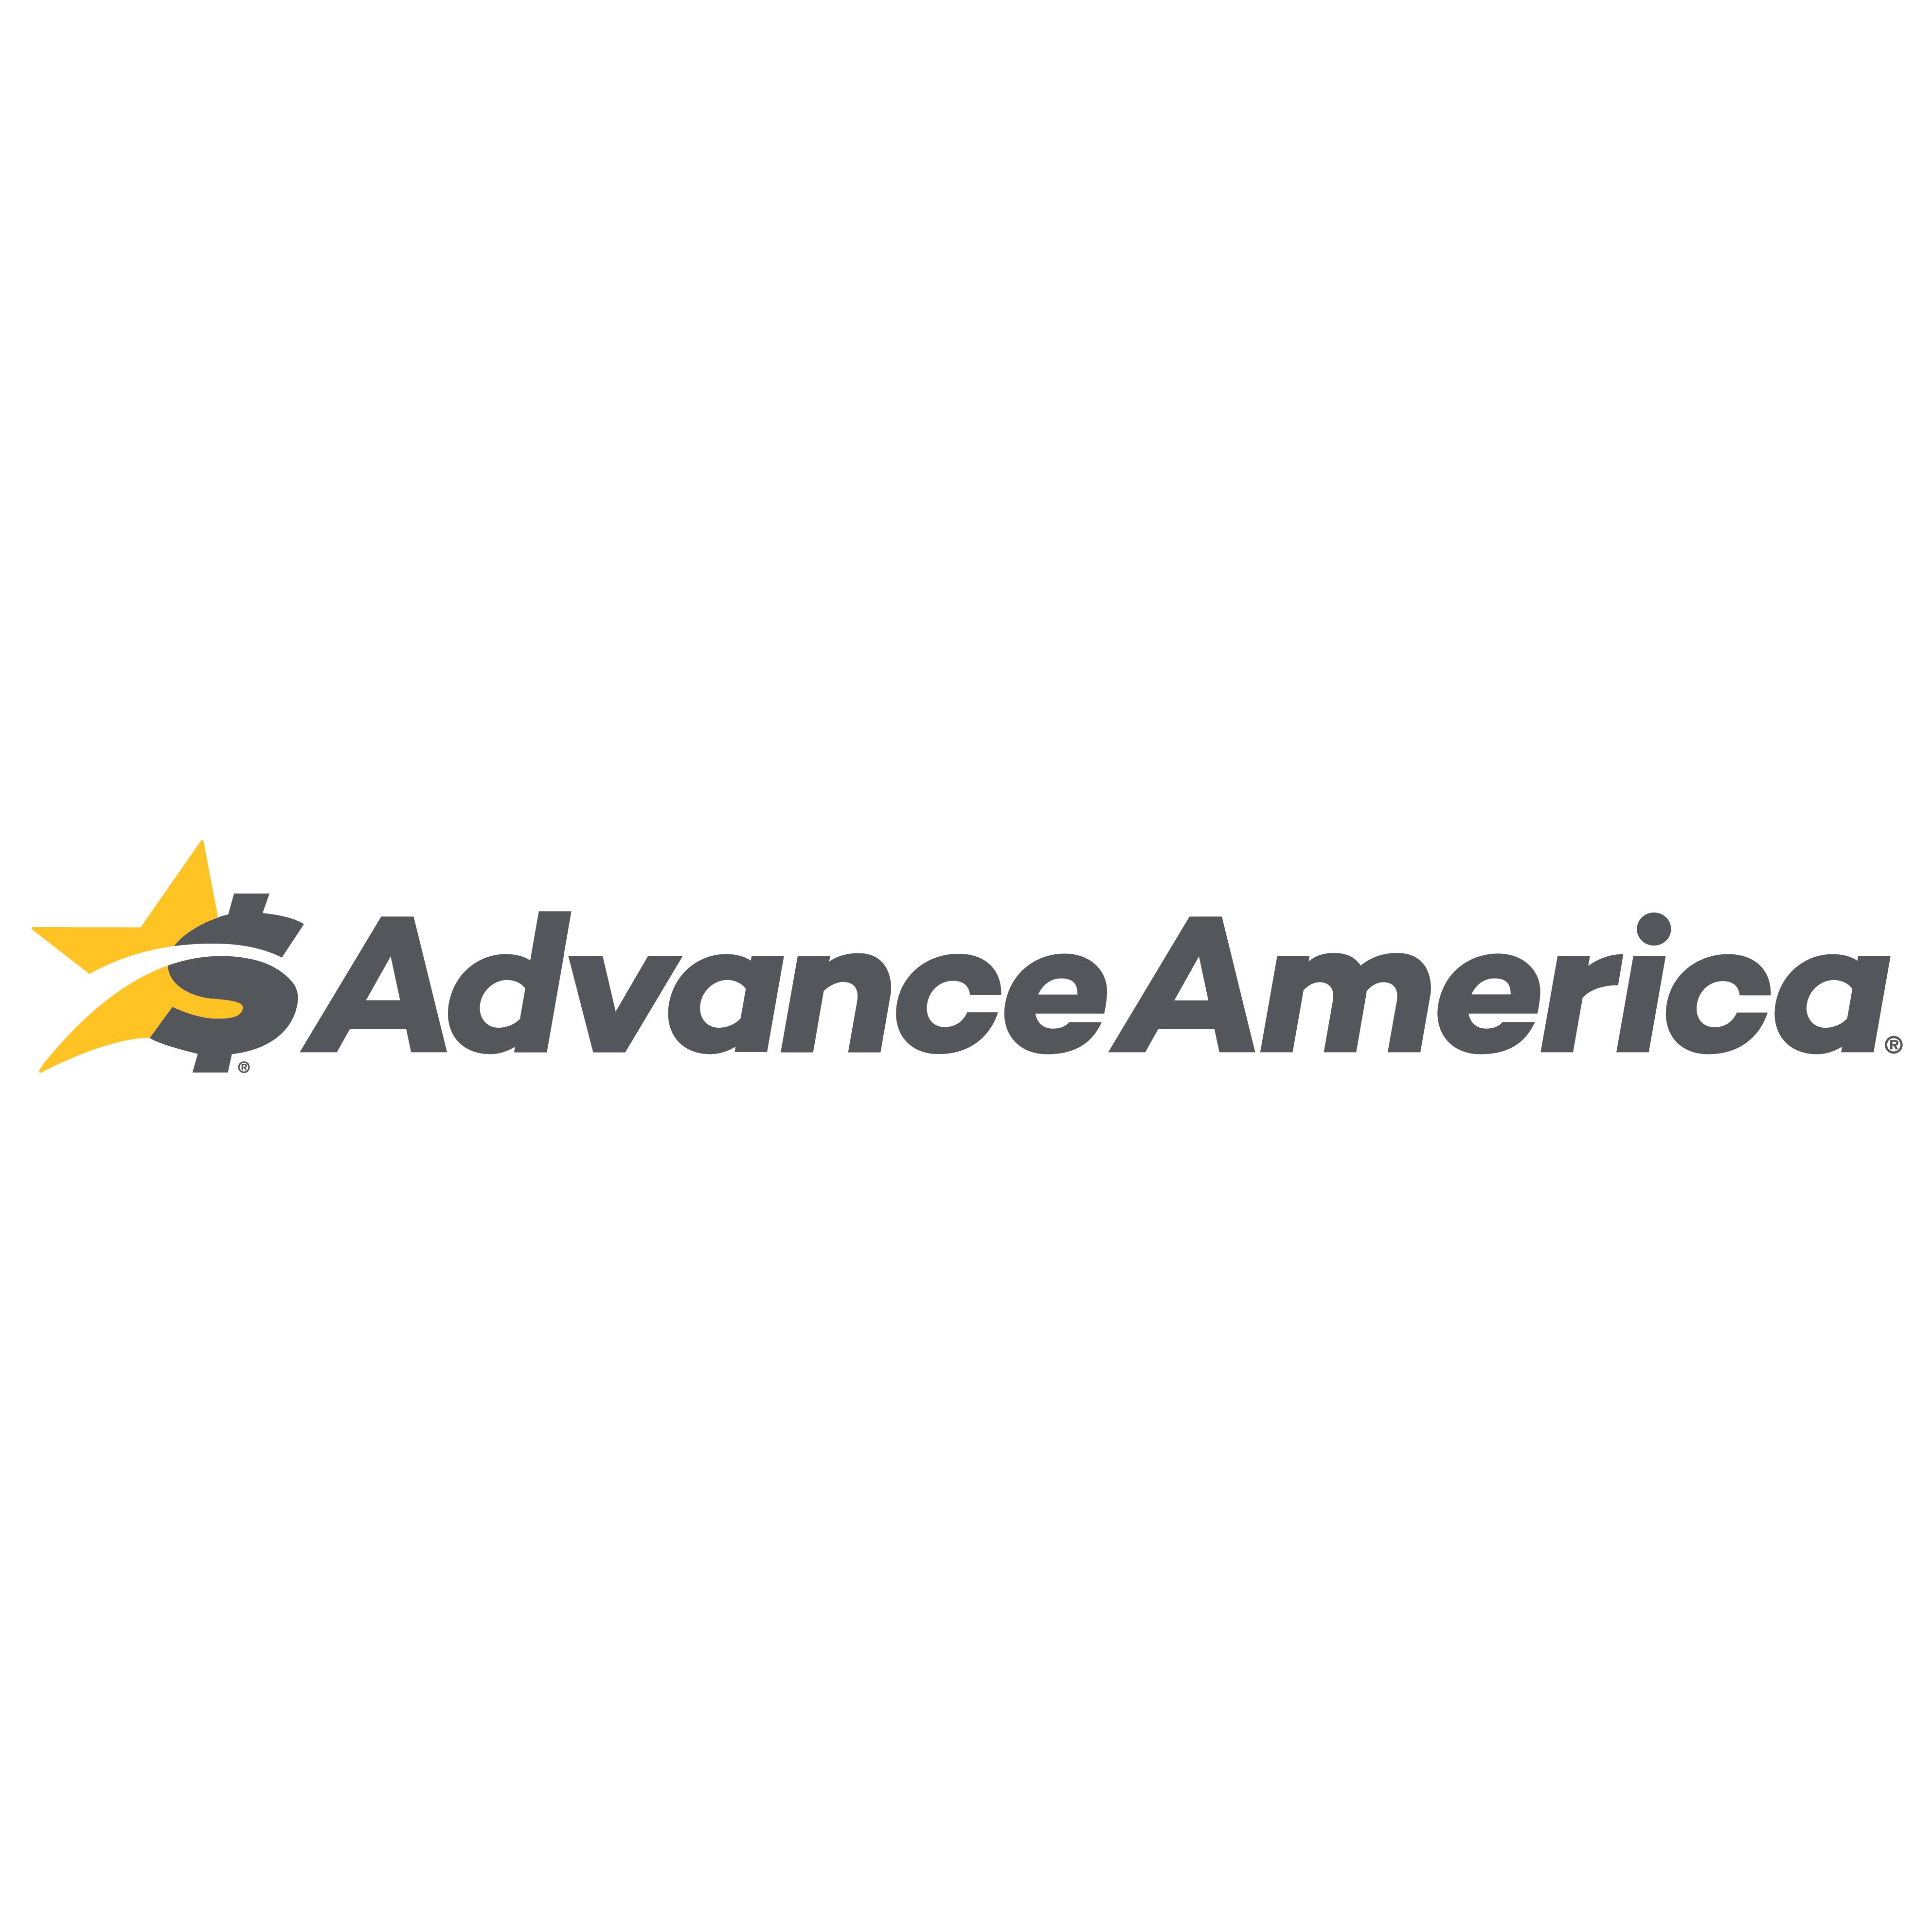 Ace payday loans visalia ca image 2